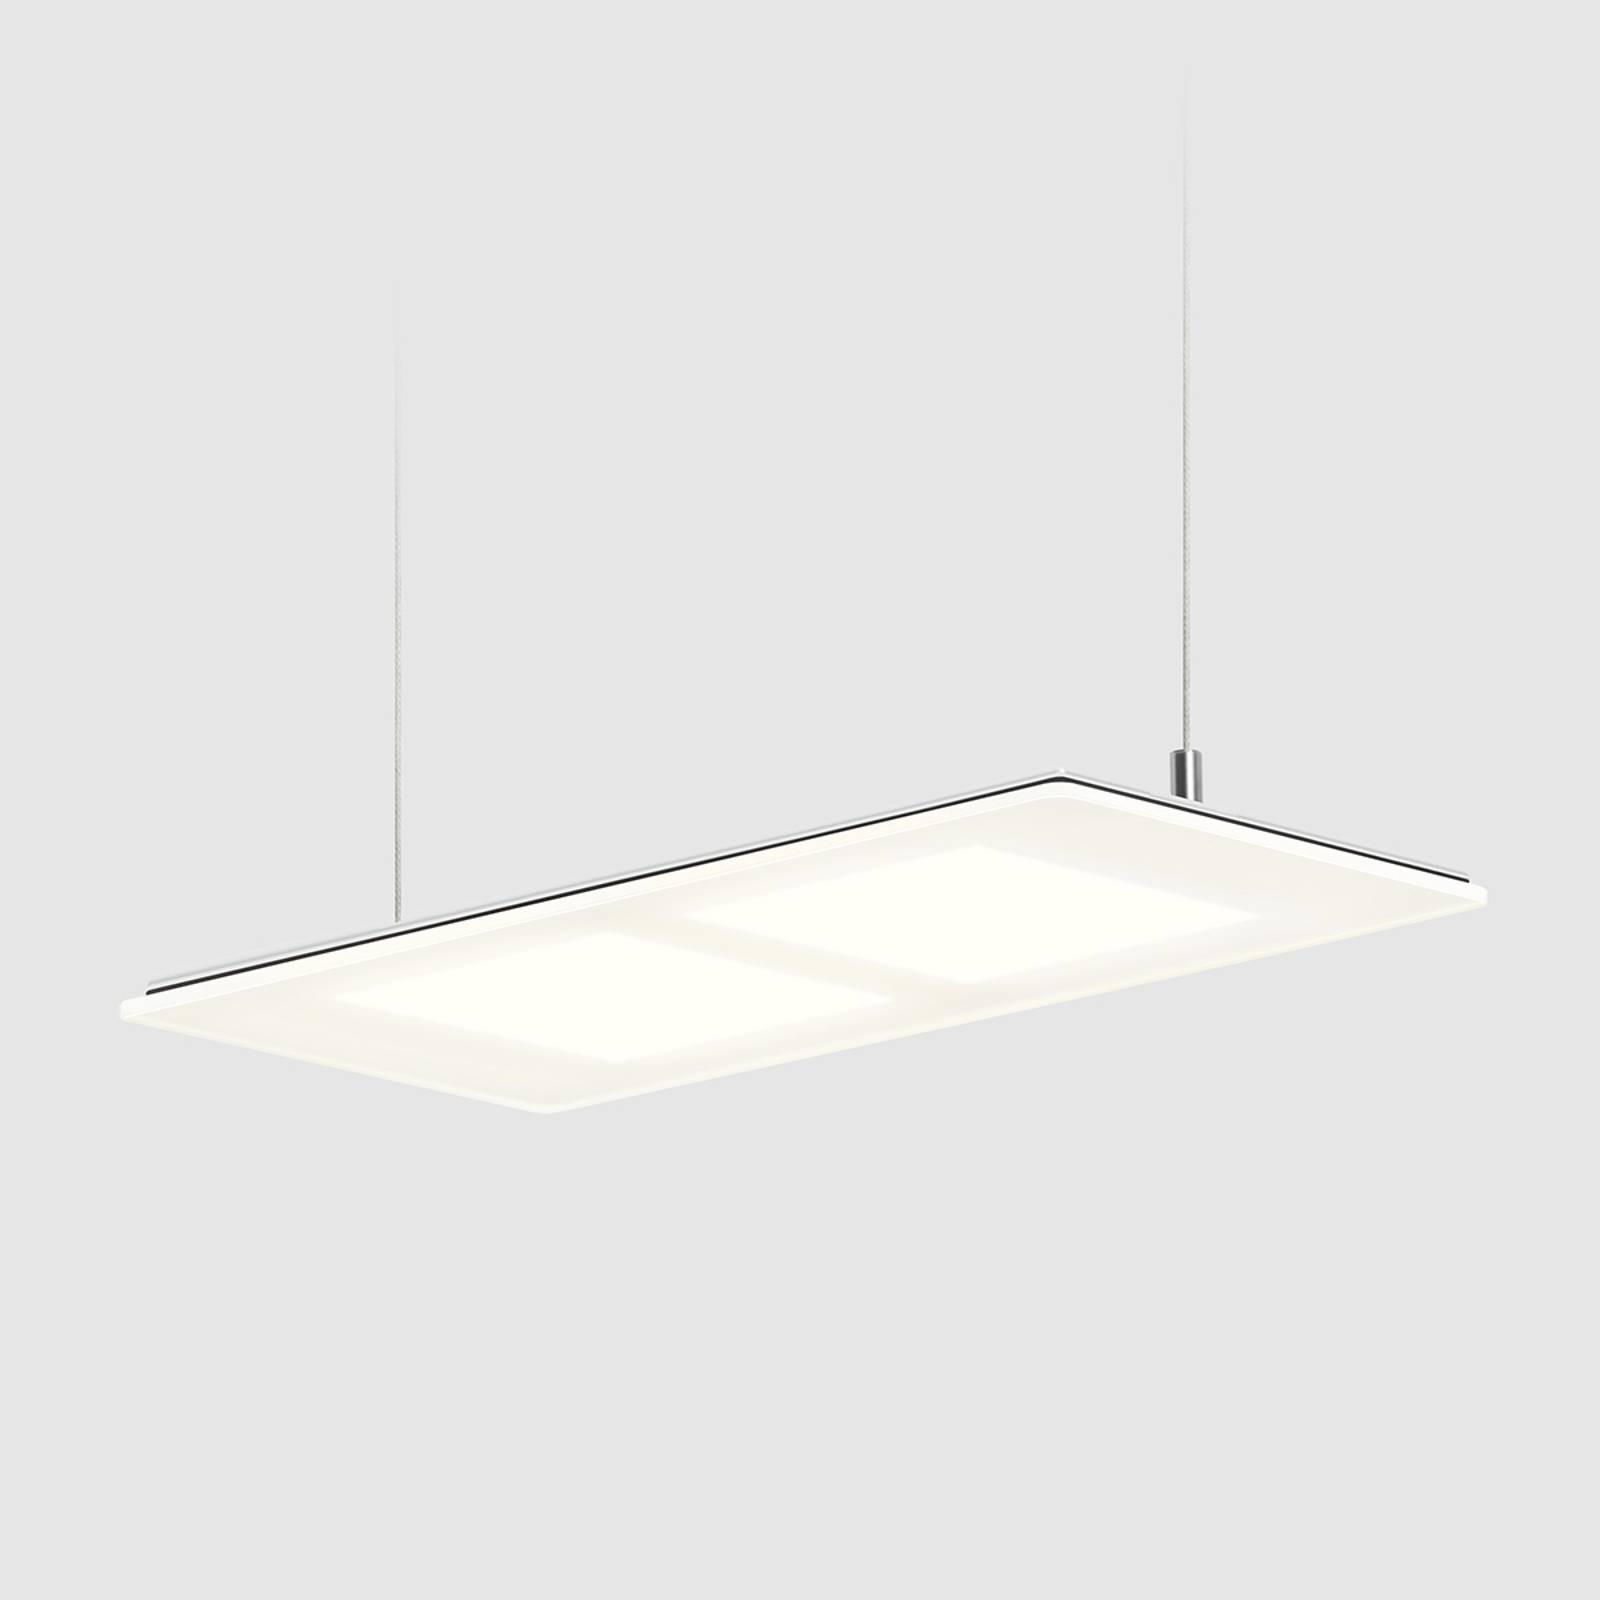 OMLED One s2 - biała lampa wisząca OLED